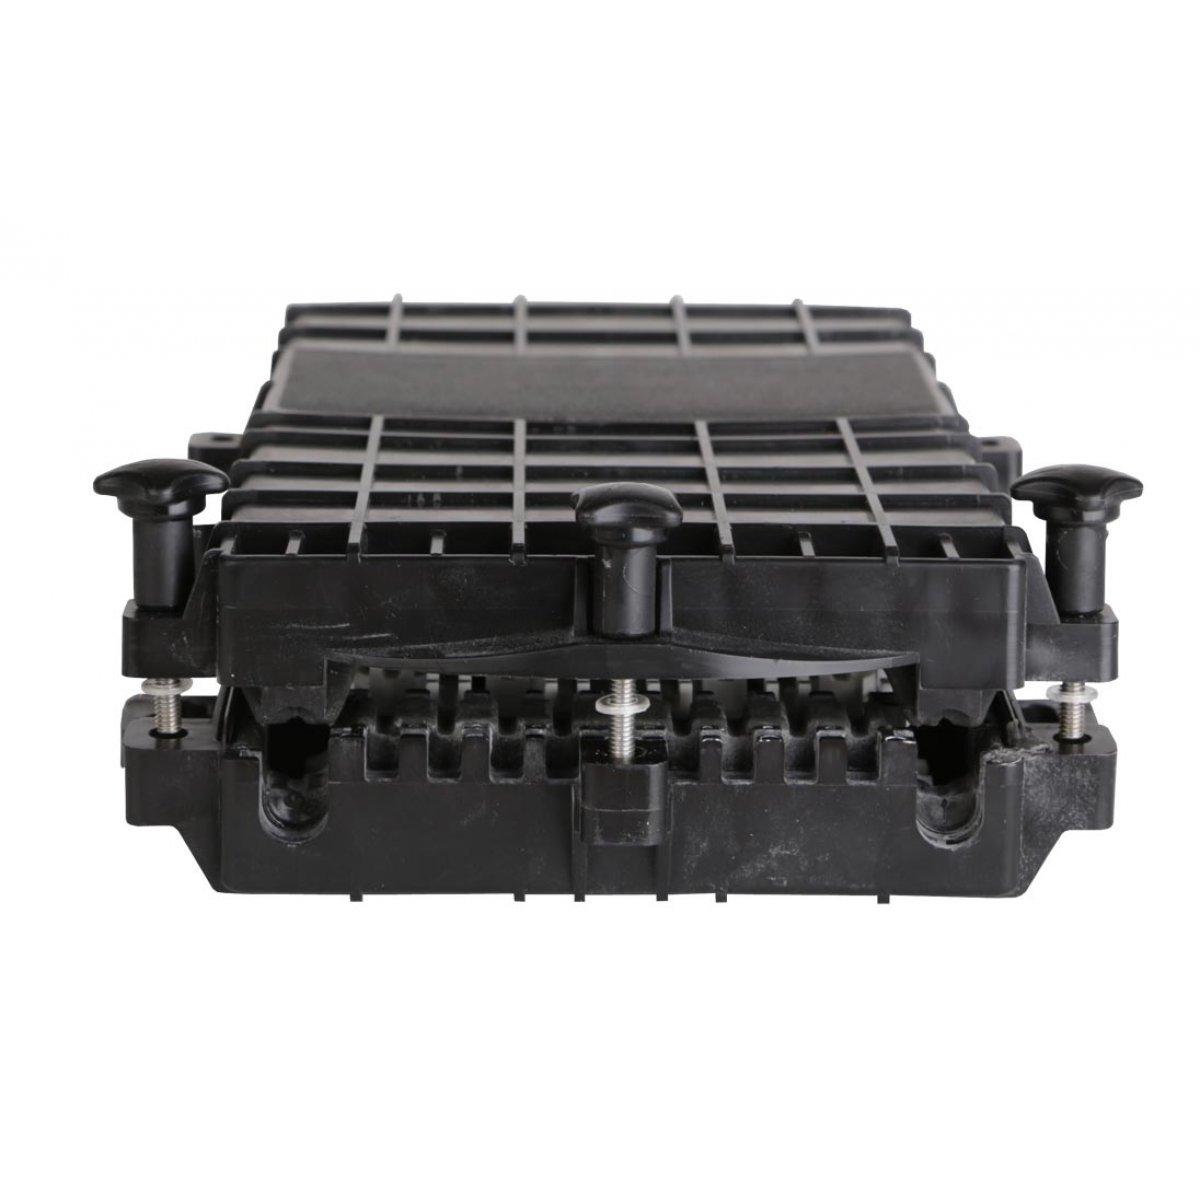 Муфта-кросс МКО-П1/A-10SC-8SC/APC-8SC/APC ССД